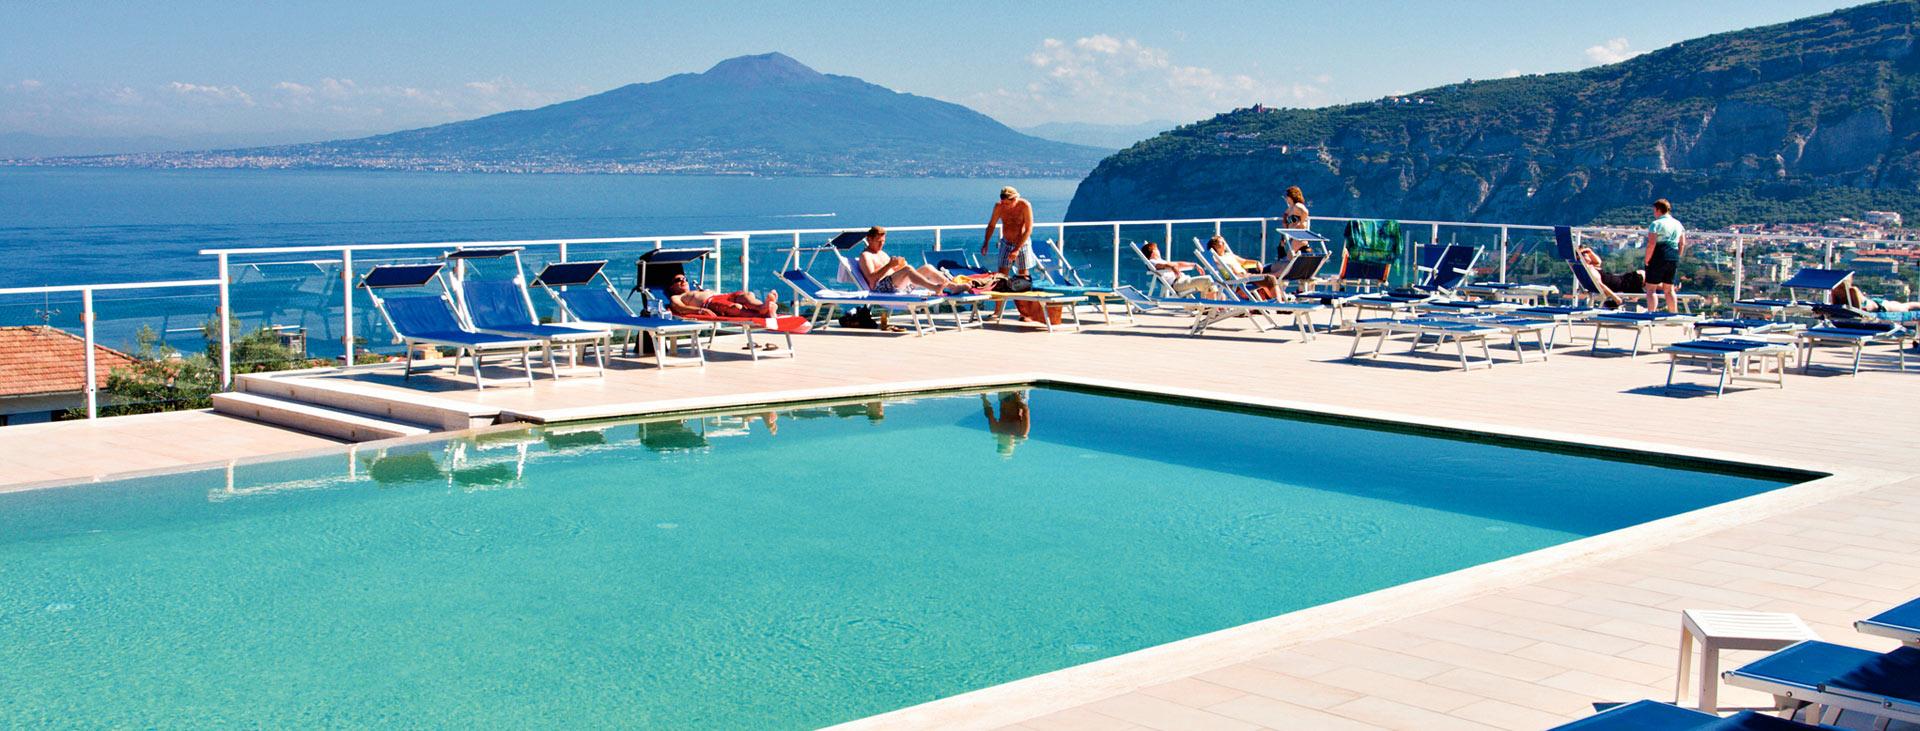 Art Hotel Gran Paradiso , Sorrento, Amalfin rannikko, Italia